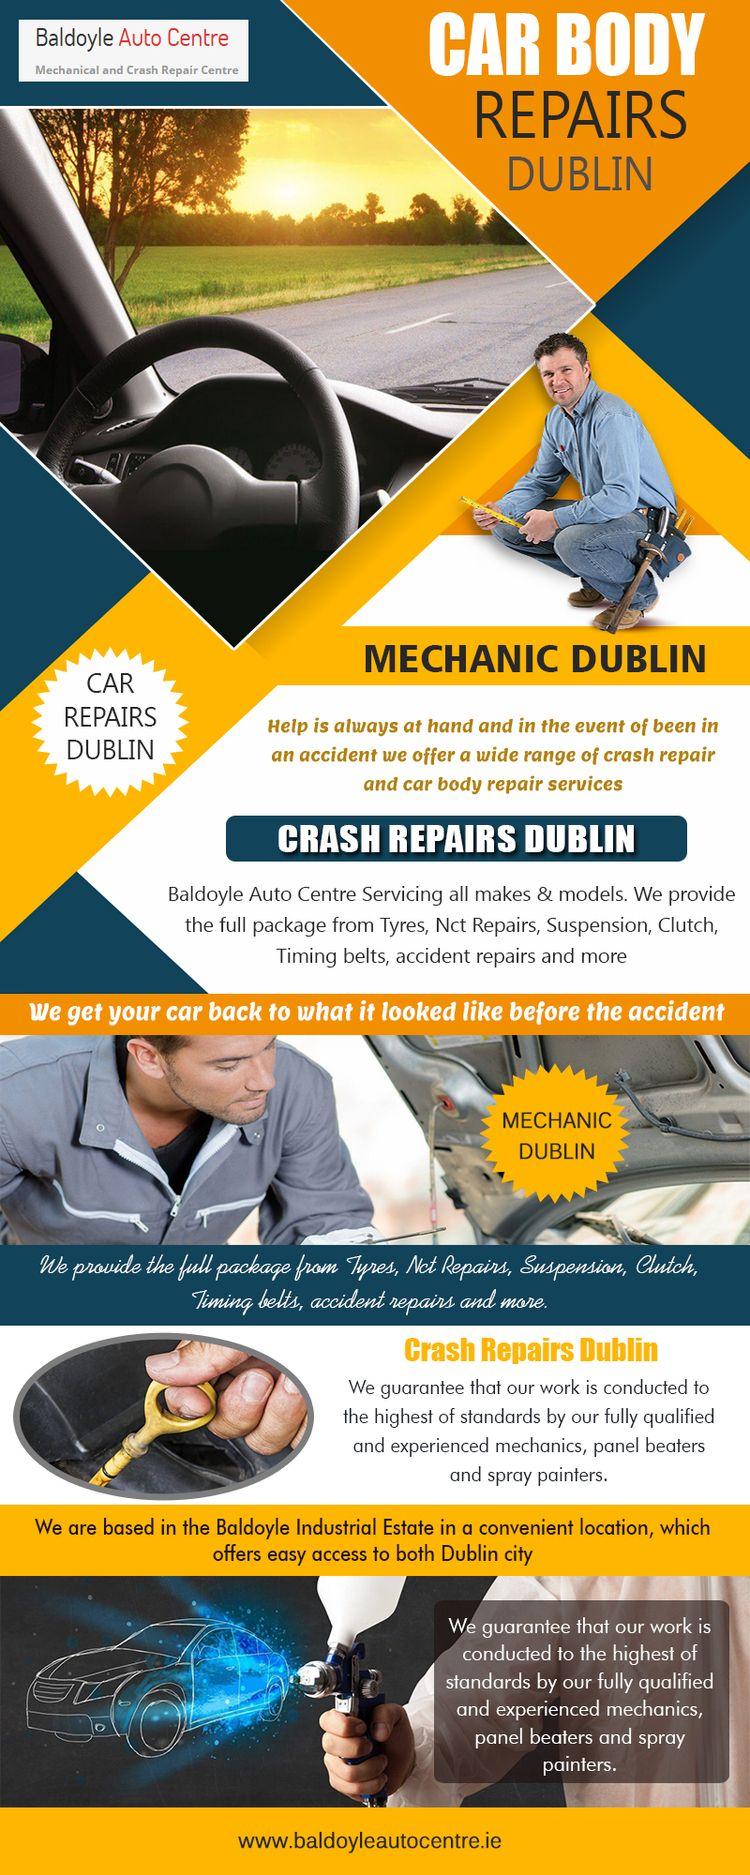 Crash repairs dublin Small bump - mechanicdublin | ello